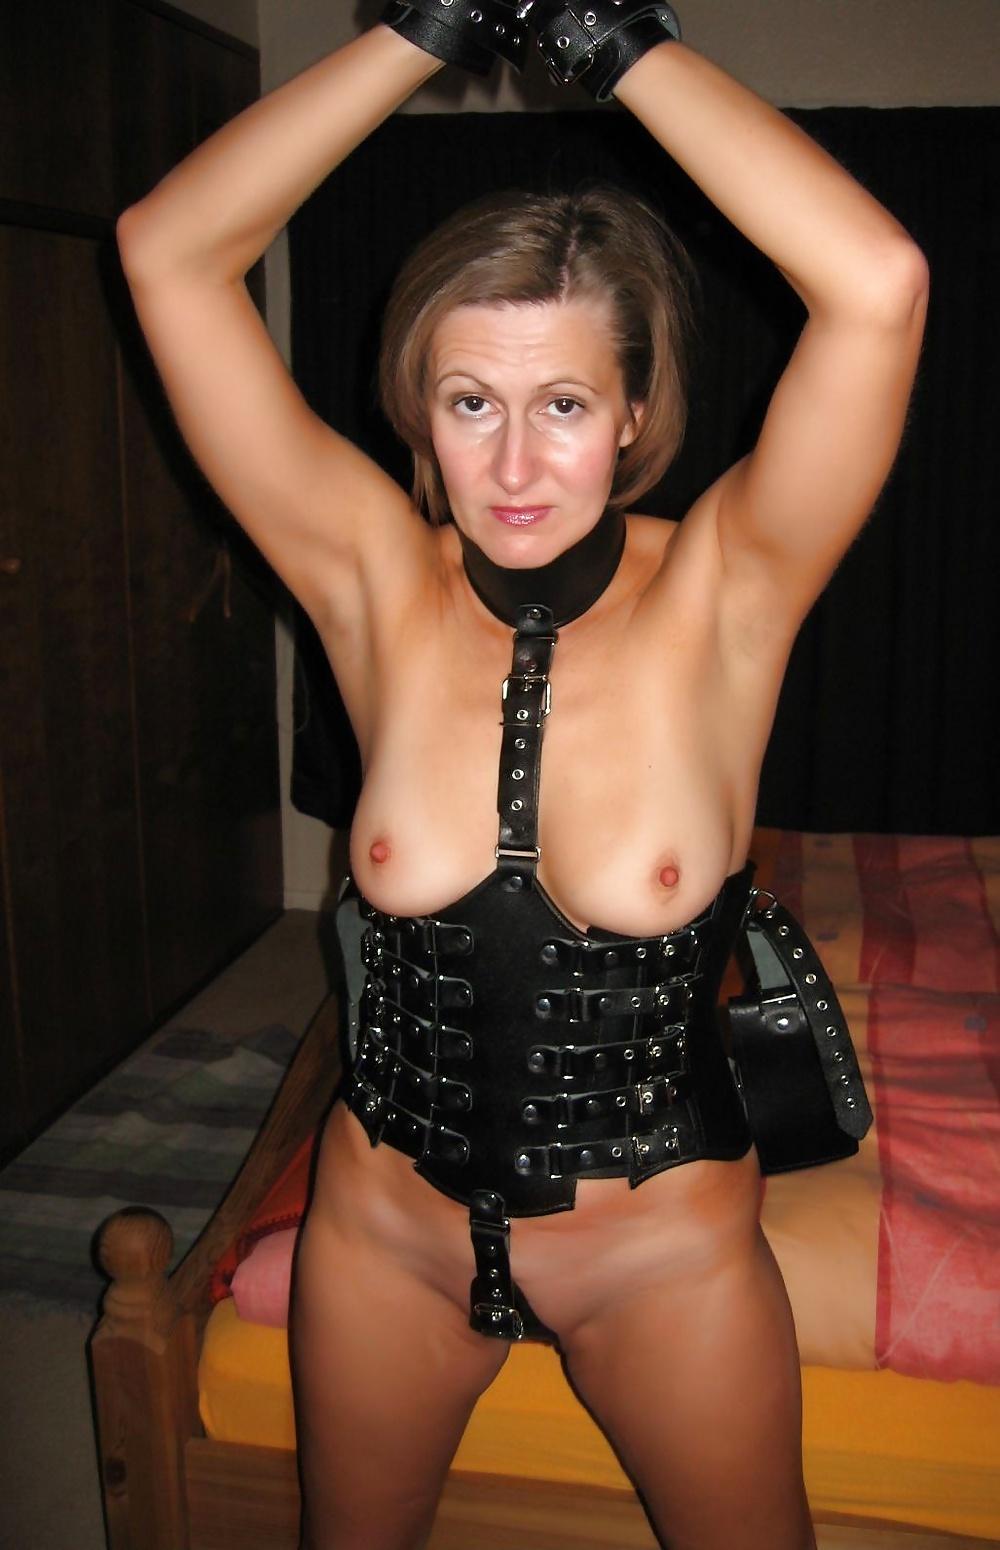 Mature slave pics photo naked